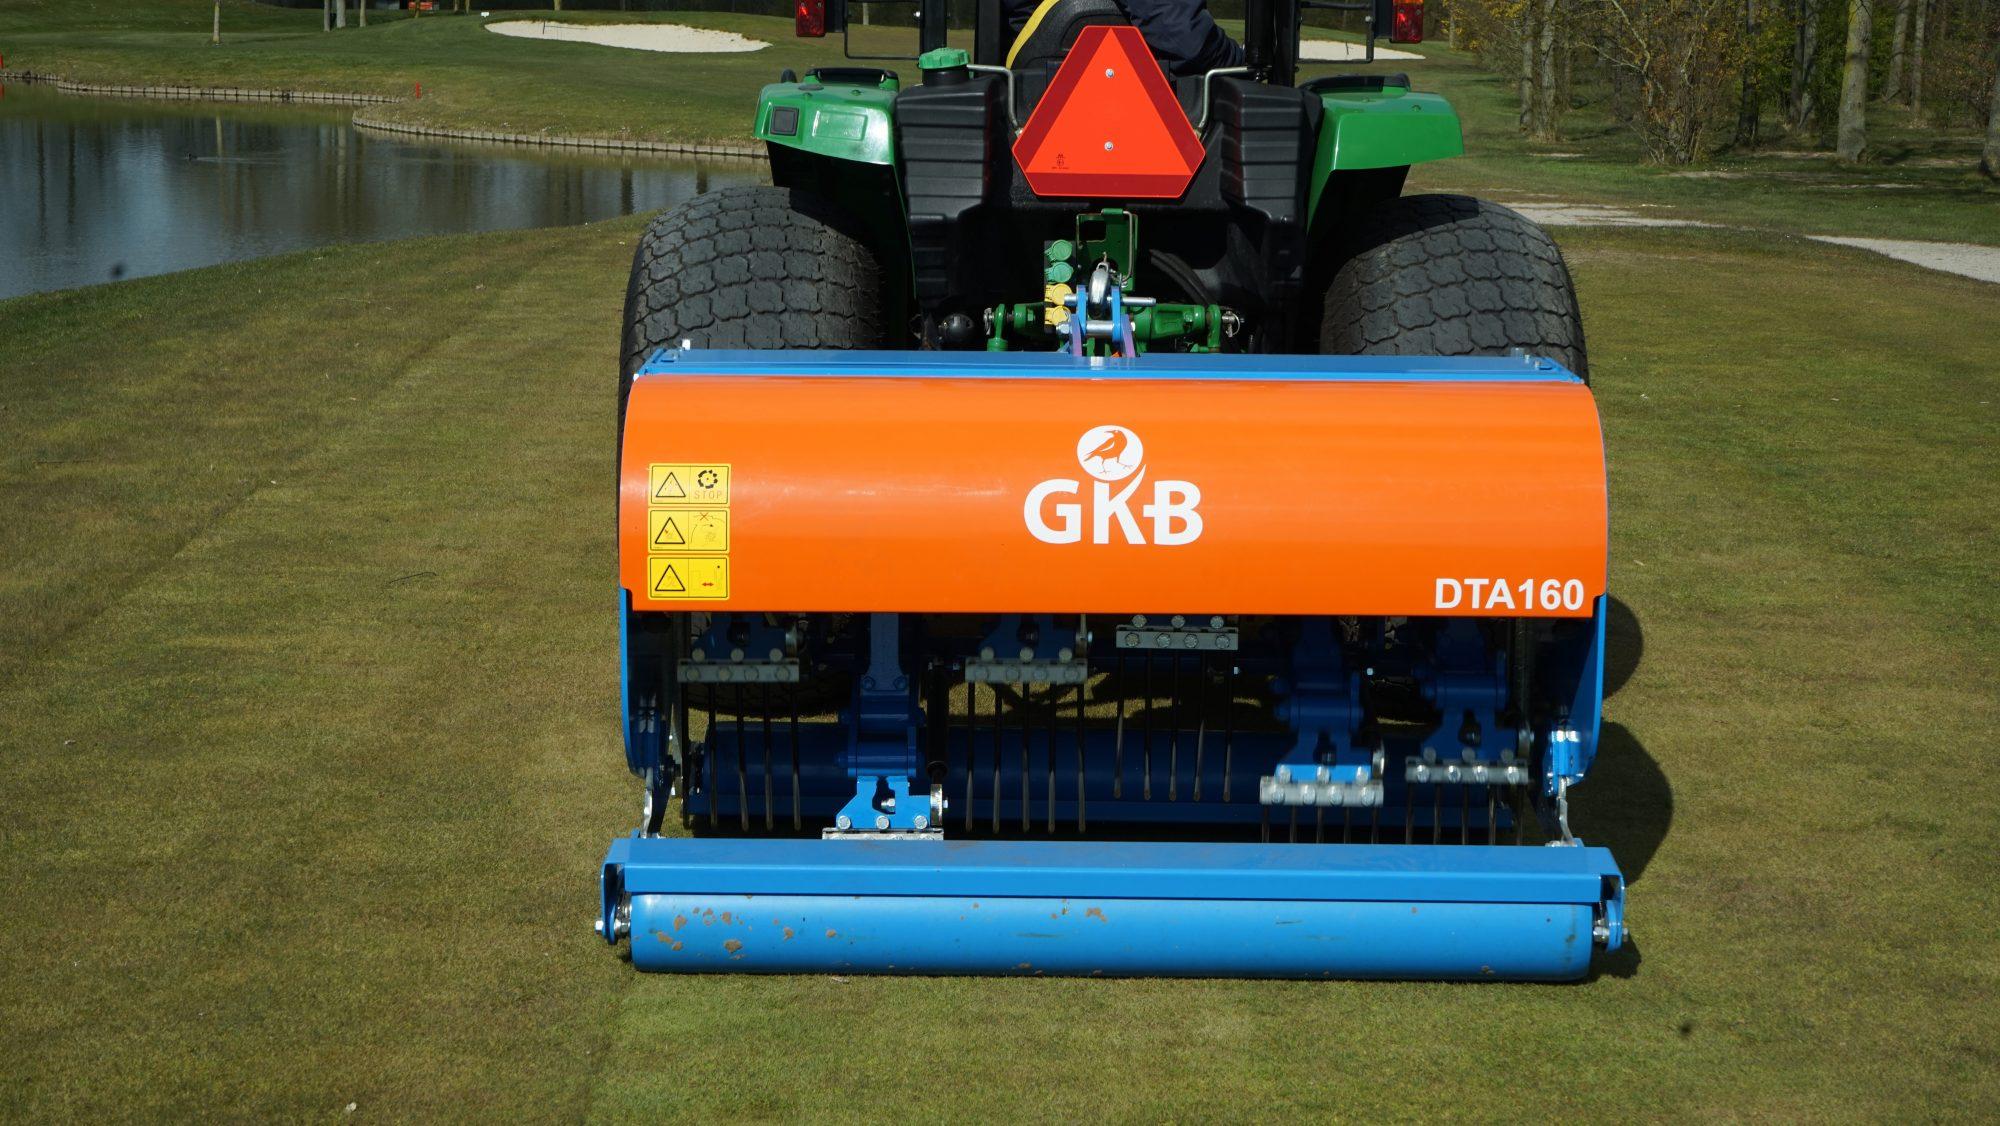 GKB Deep Tine Aerator 160